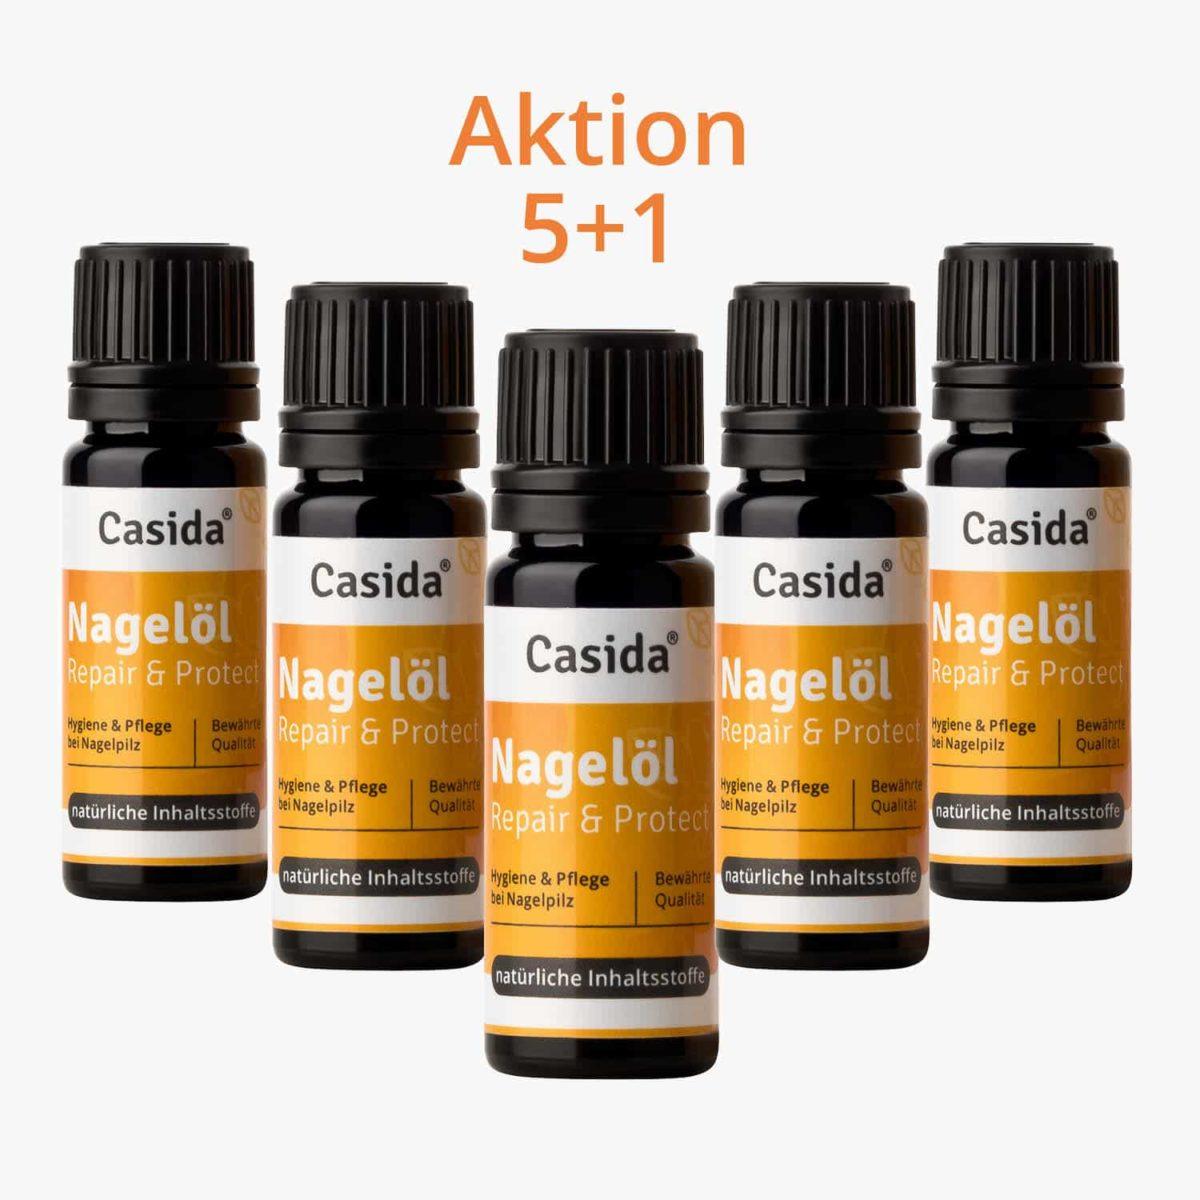 Casida Set 5 +1 Nagelöl Repair & Protect 10 ml PZN 10022445 Apotheke Nagelpilz Füße Hände (1)